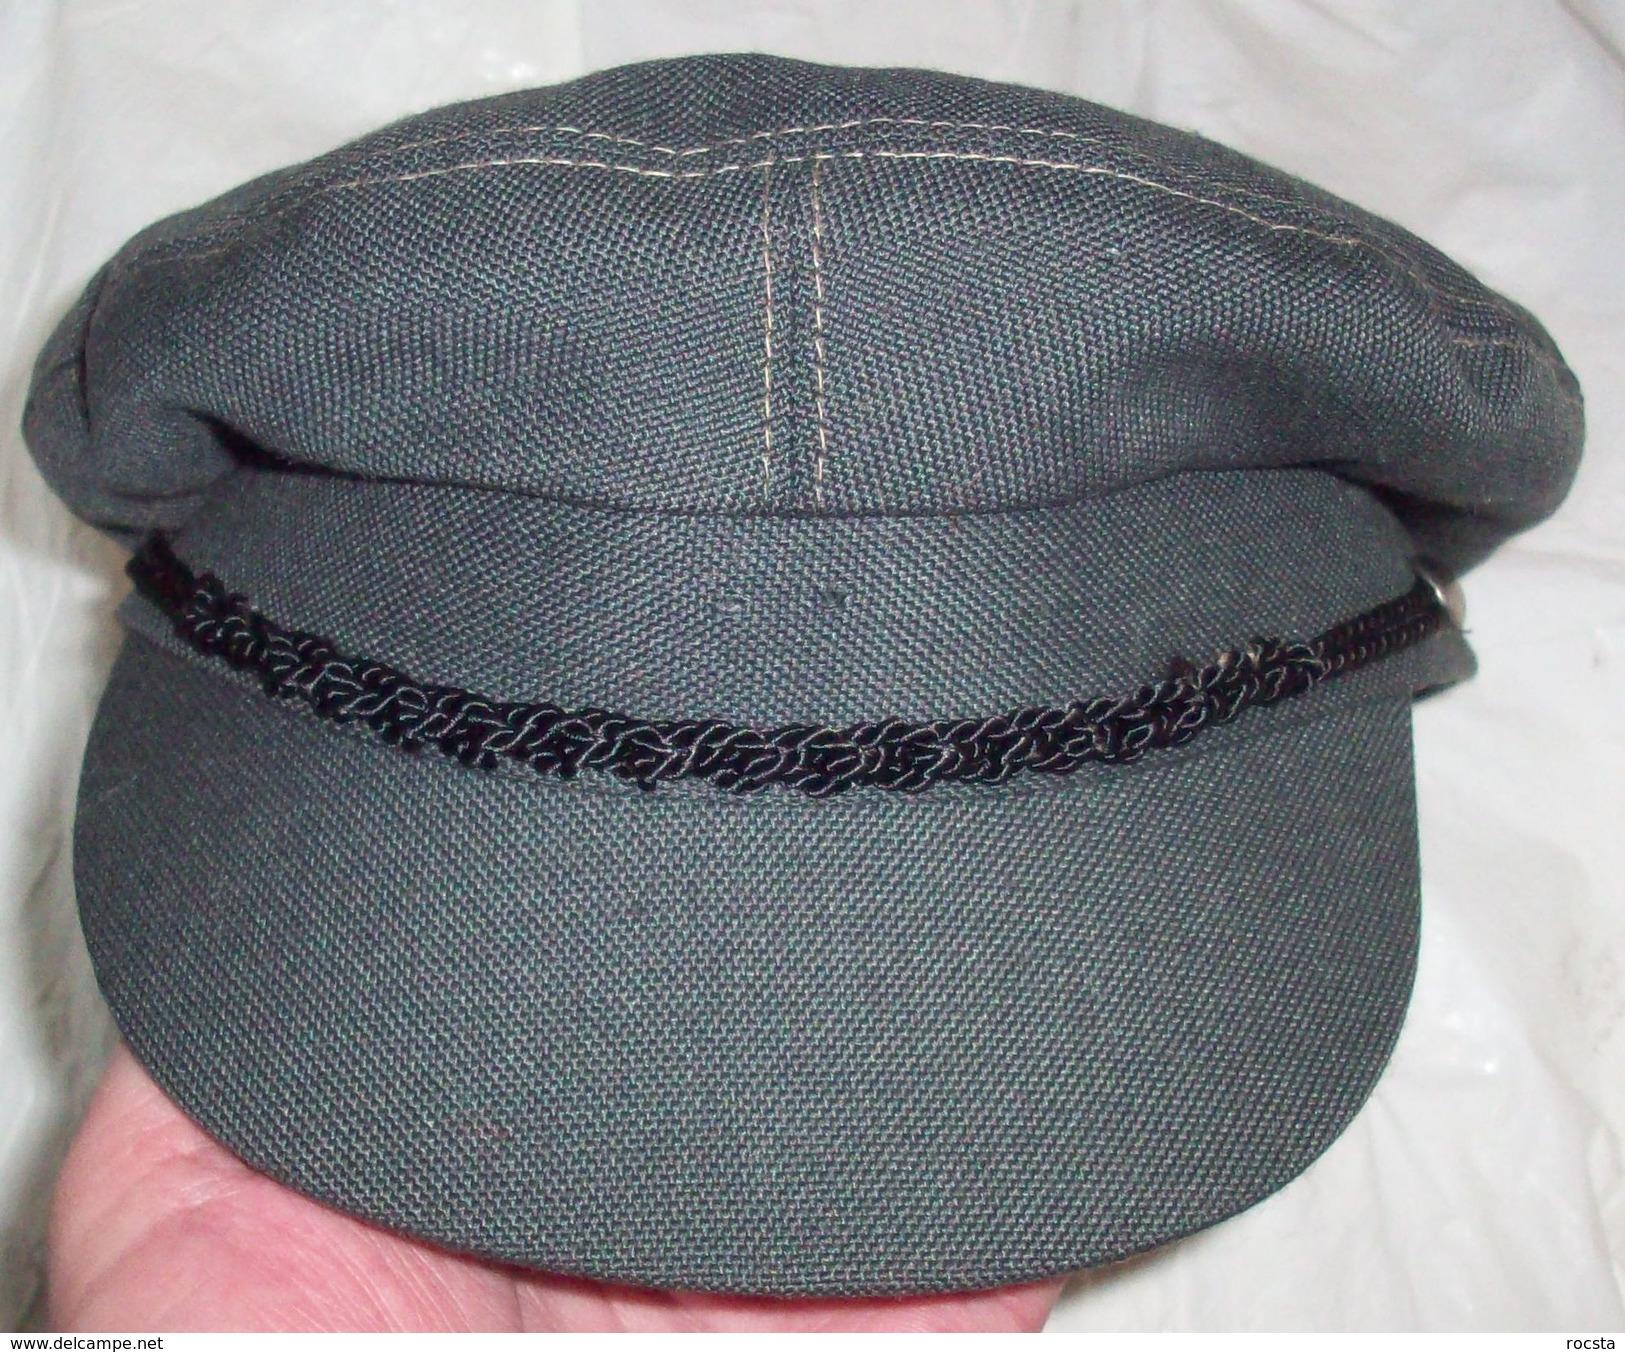 "Cap ""Závodní Stráže"" - Factory Volunteer Corps Of The People's Militia Of Czechoslovakia (1986 Dated) - Hoeden"